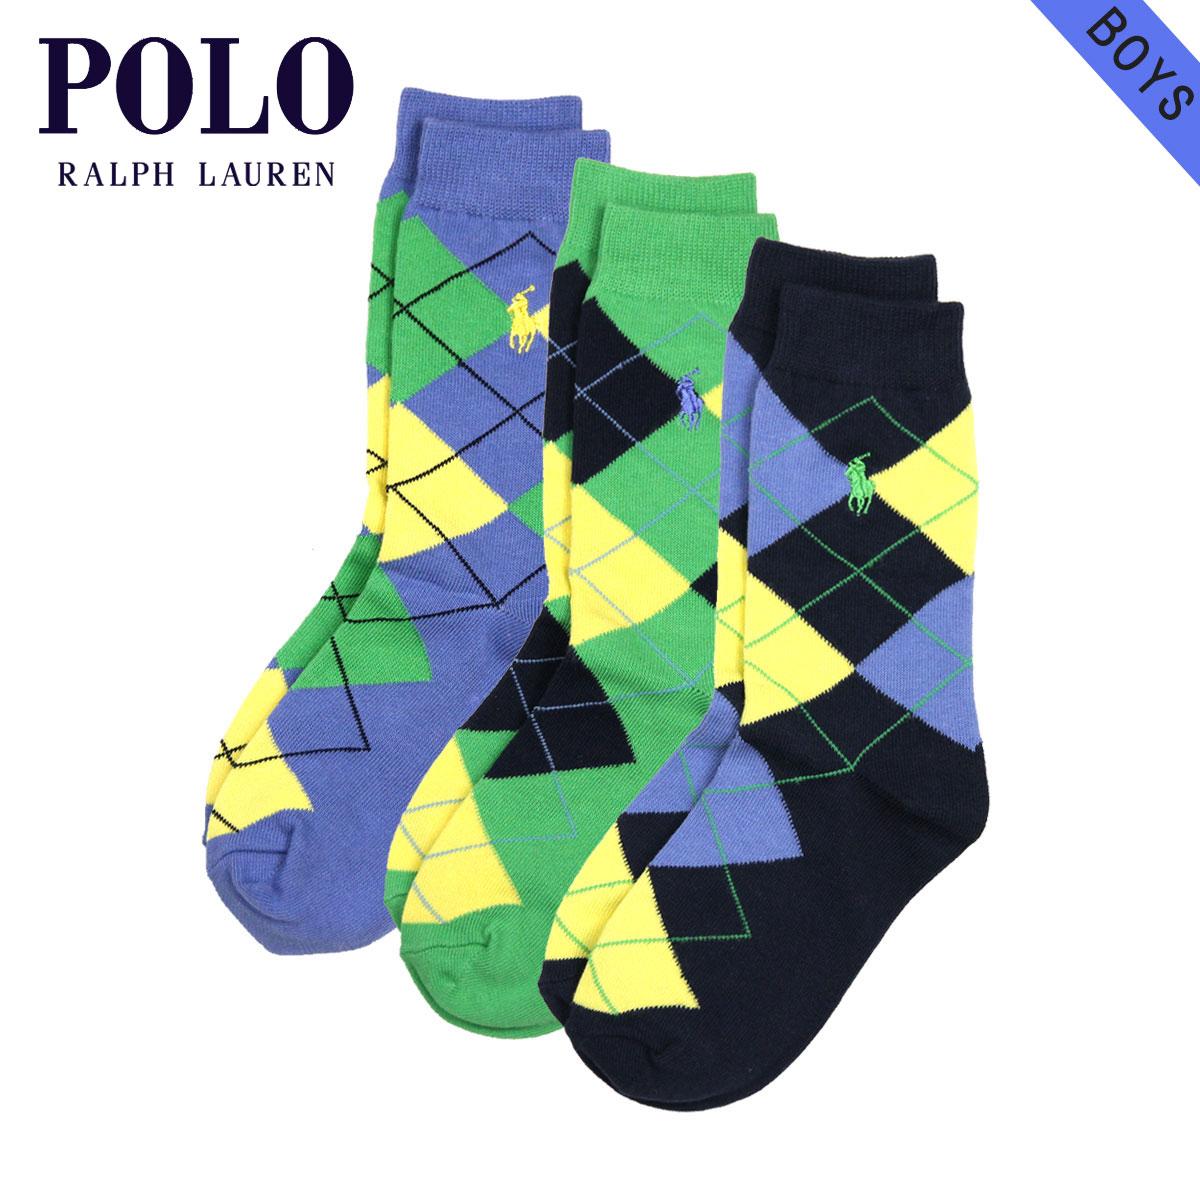 ae4d444c3 Rakuten Ichiba shop MIXON  Polo Ralph Lauren kids POLO RALPH LAUREN CHILDREN  regular article children s clothes Boys socks ARGYLE COTTON SOCK 3-PACK ...